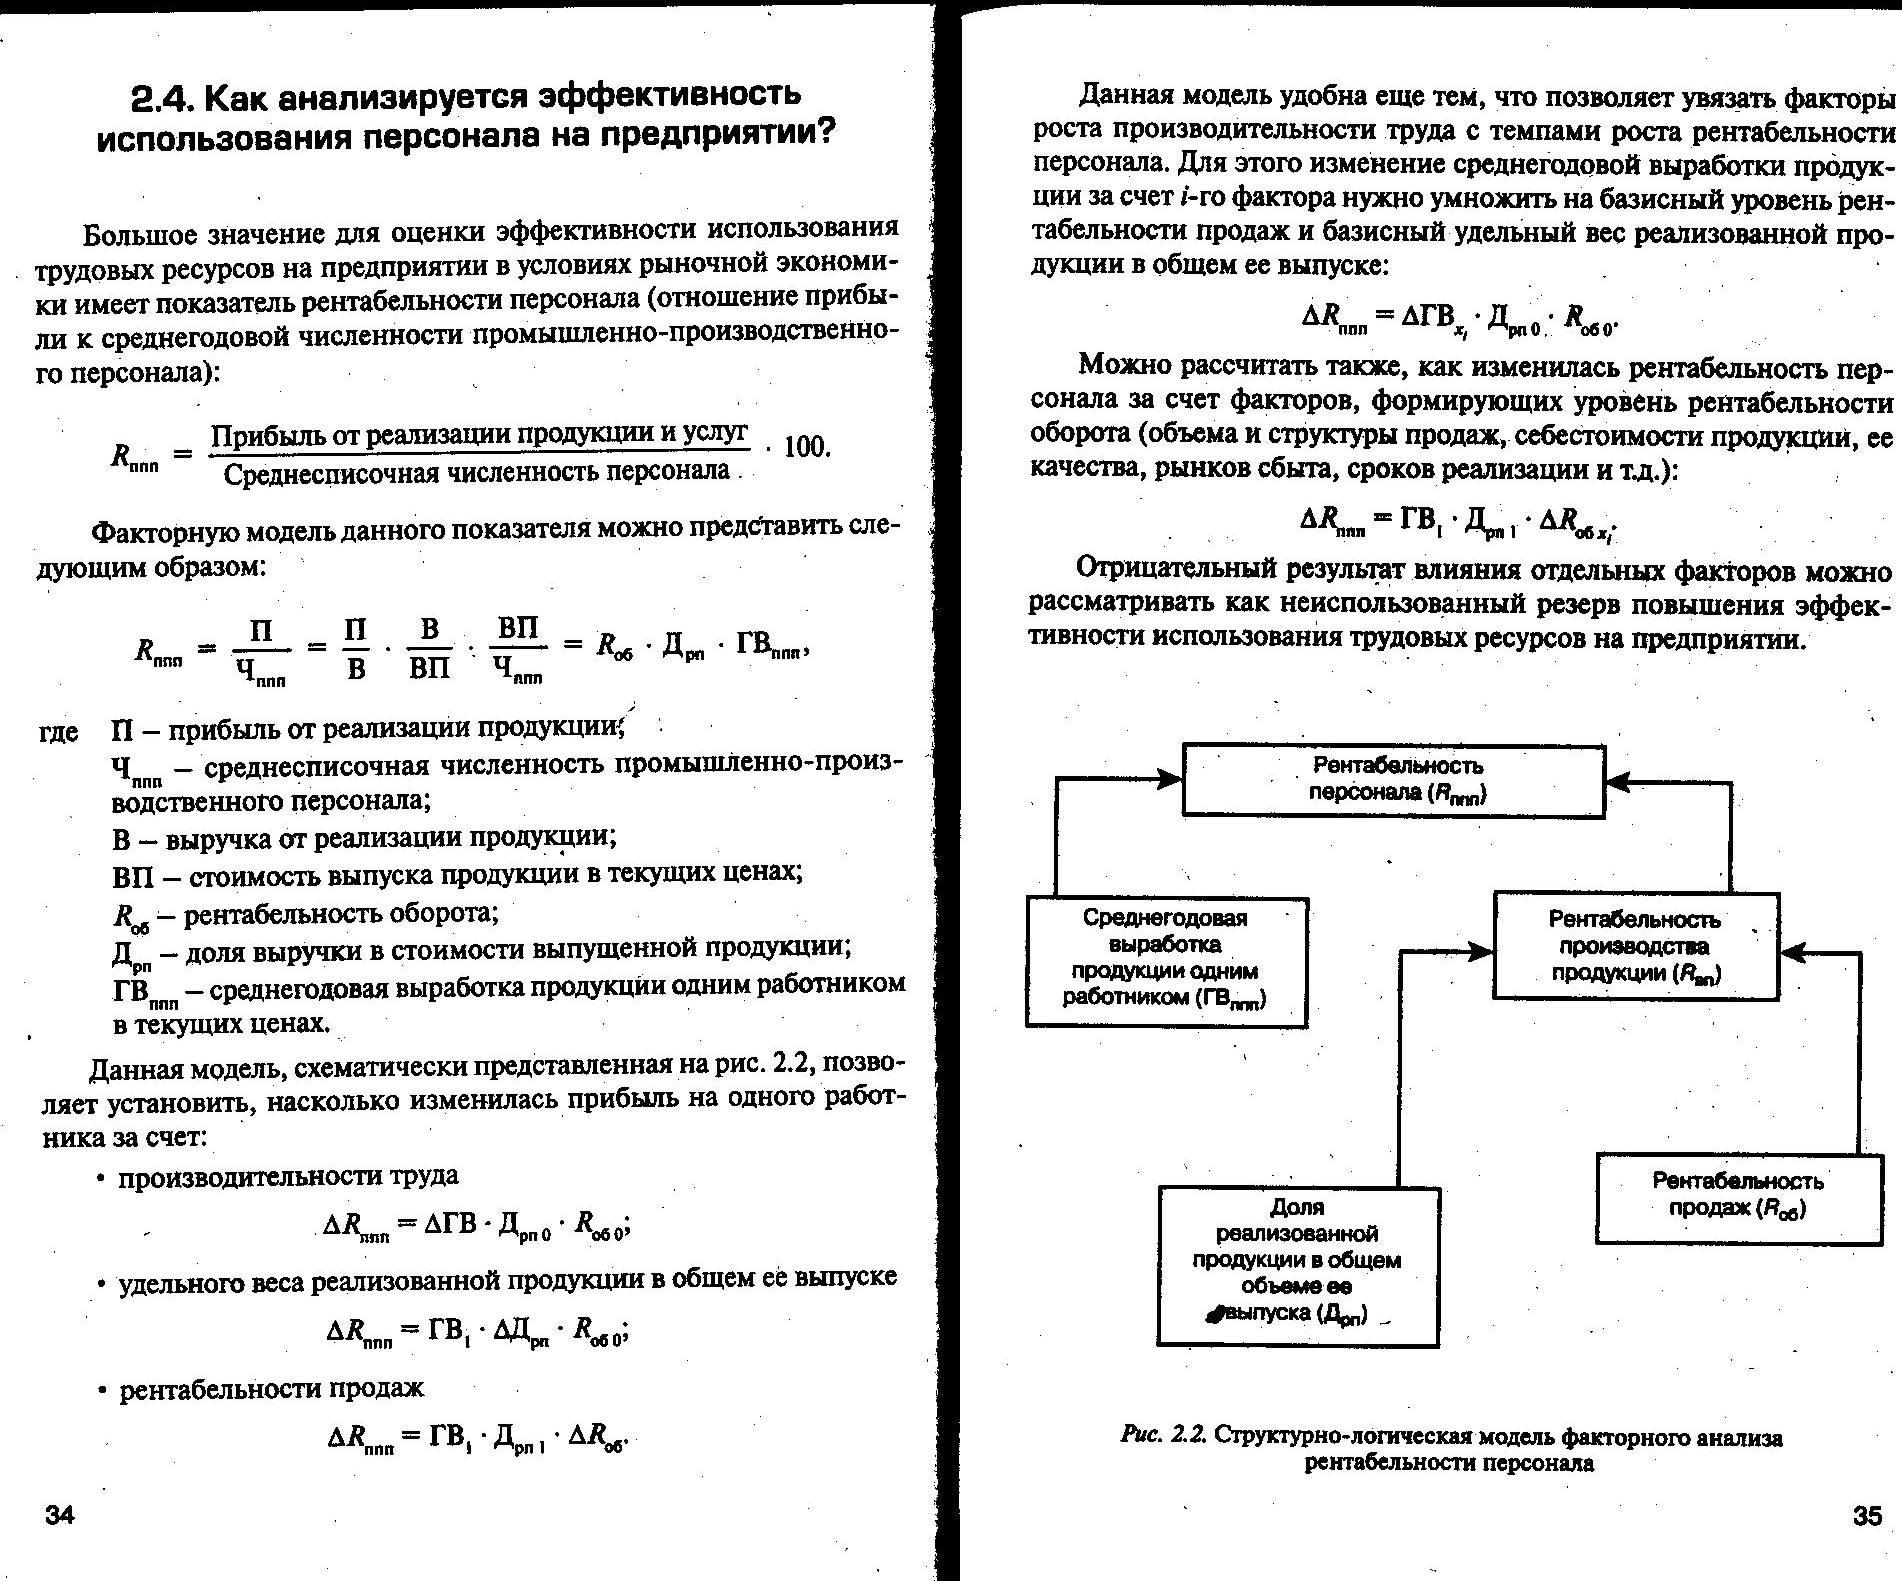 Анализ использования персонала предприятия отчет по практике 1720